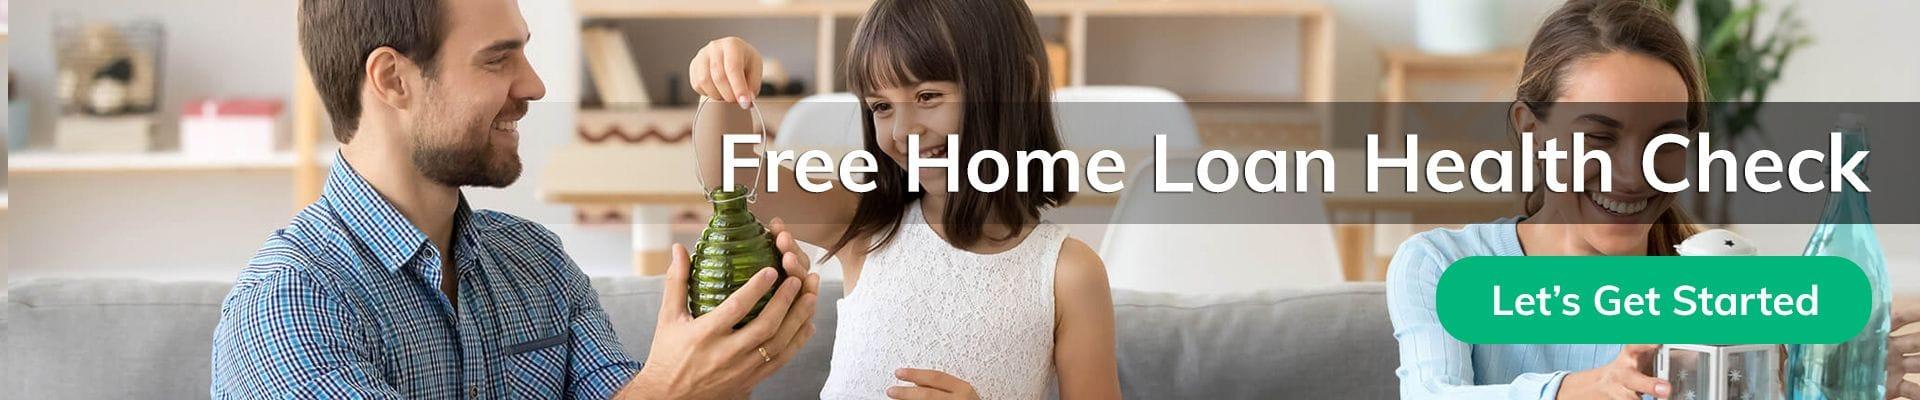 Home Loan Health Check